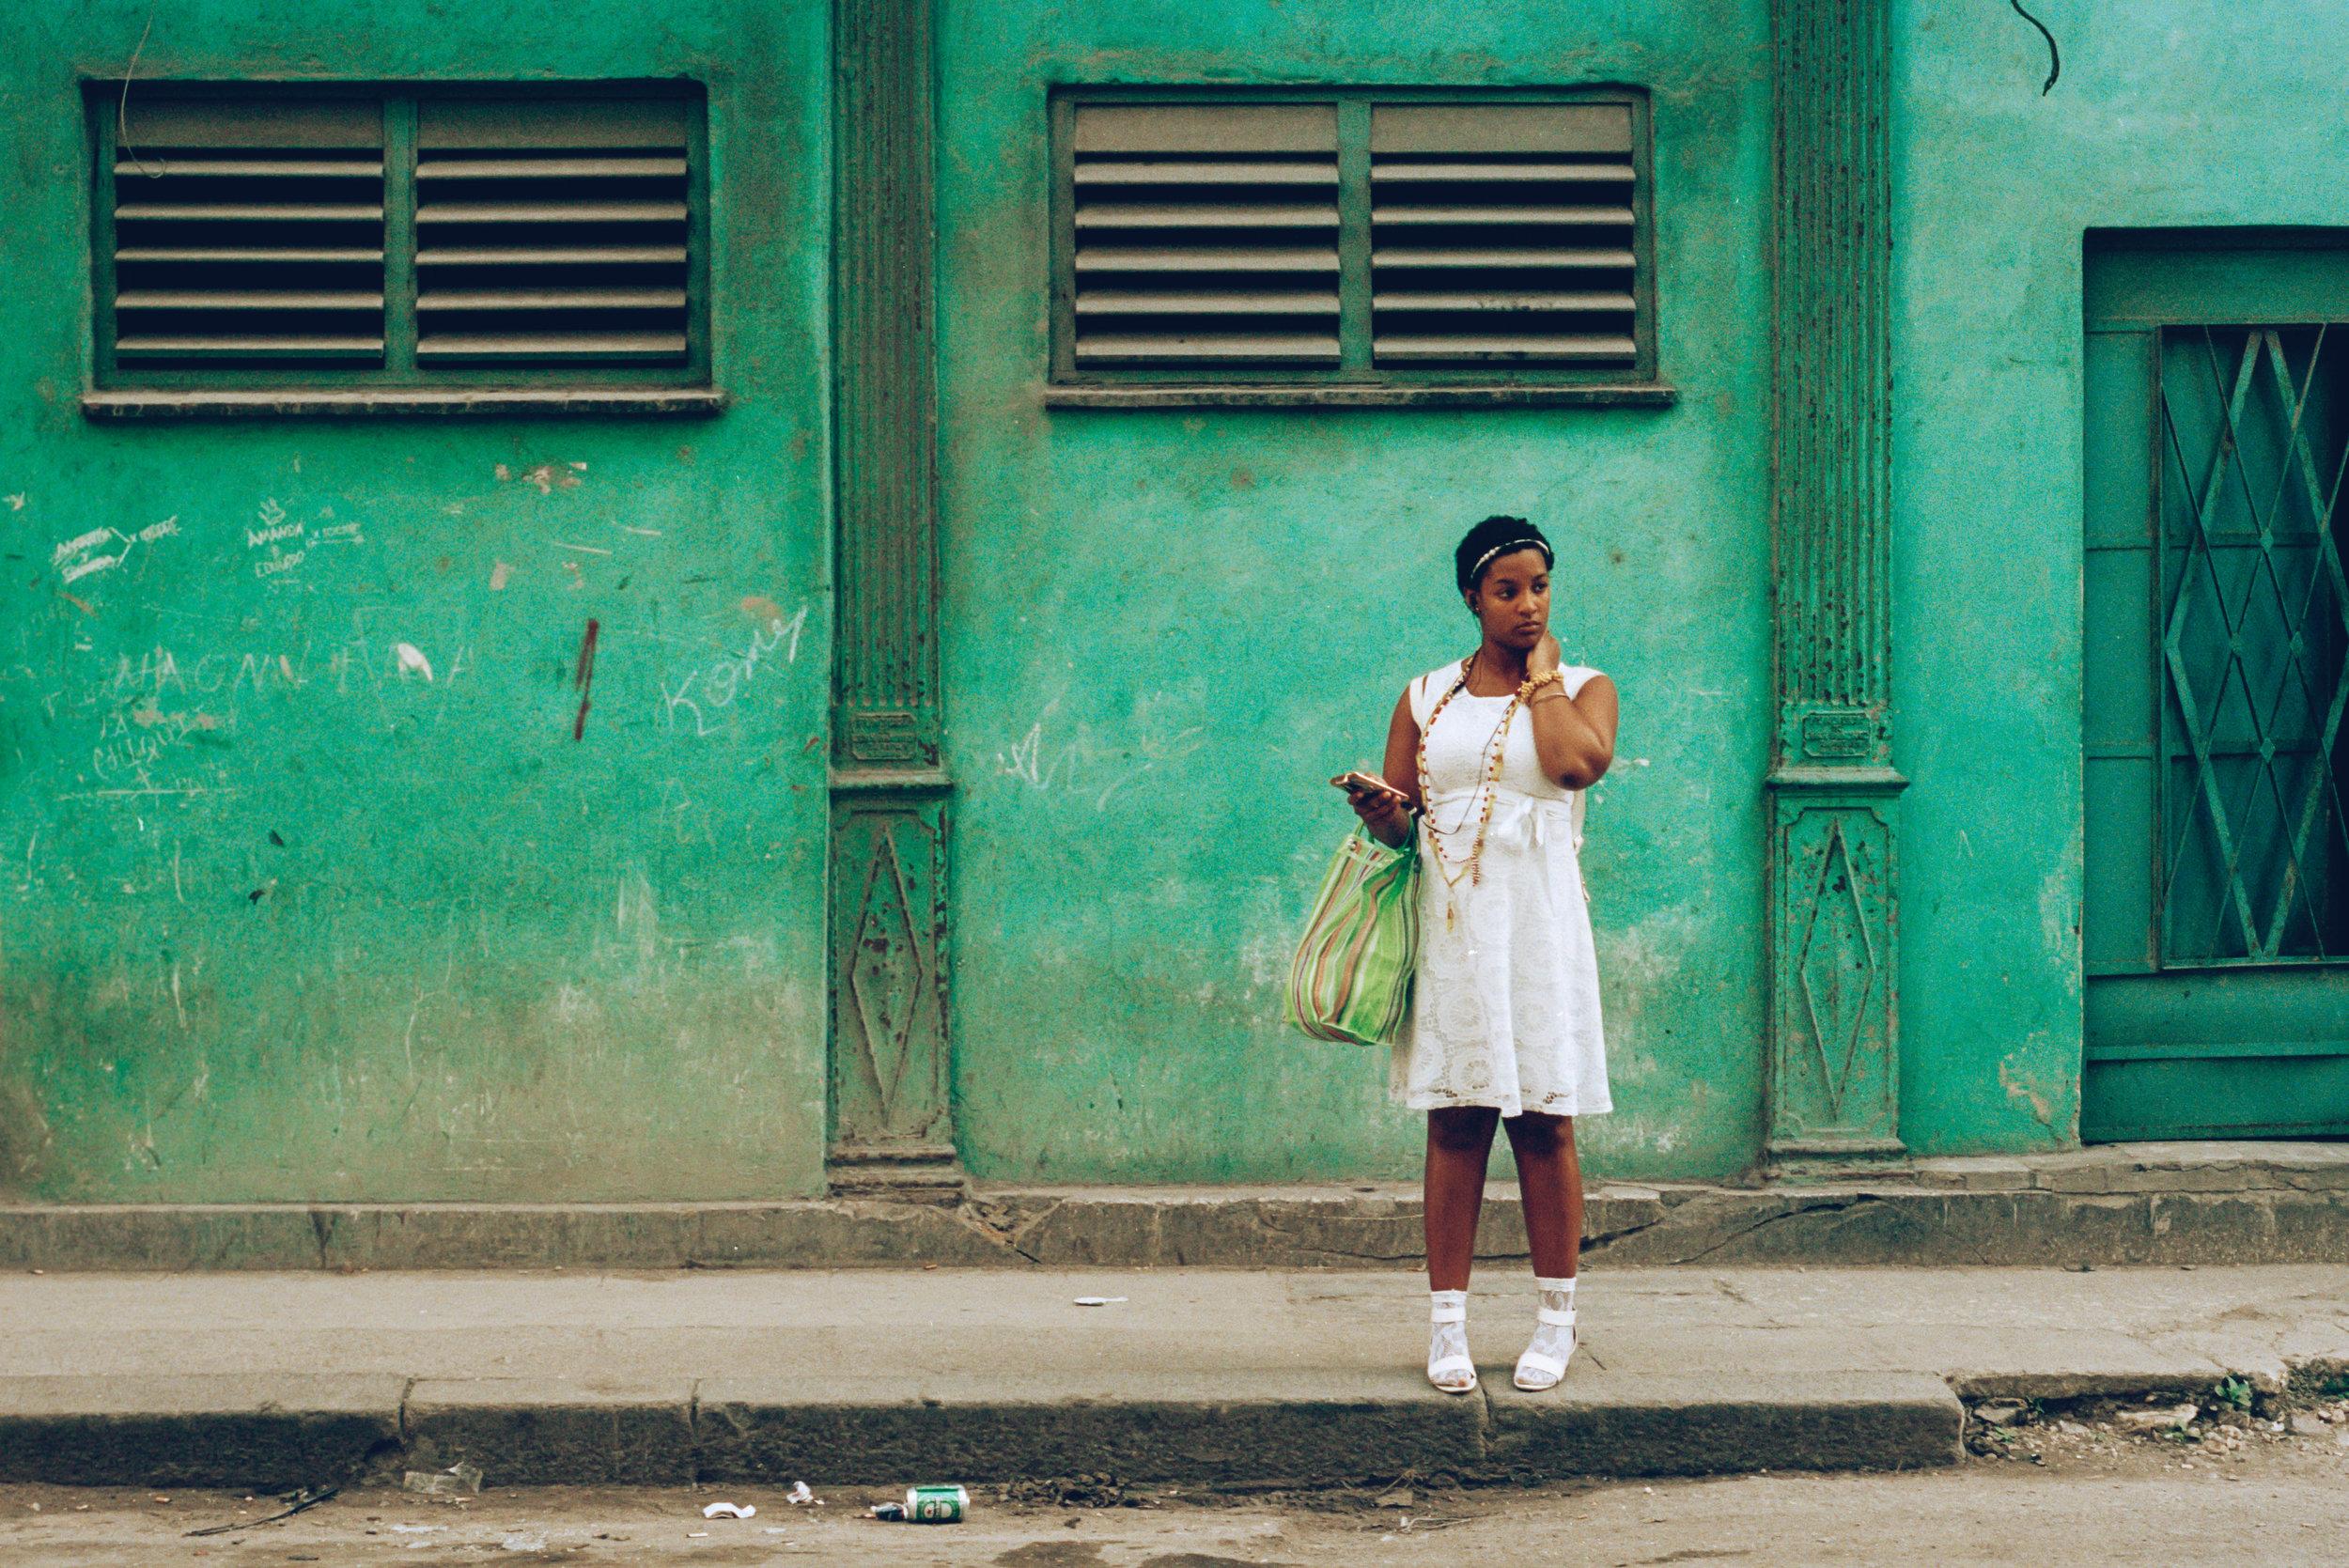 93120009 cuba havana woman green wall.jpg